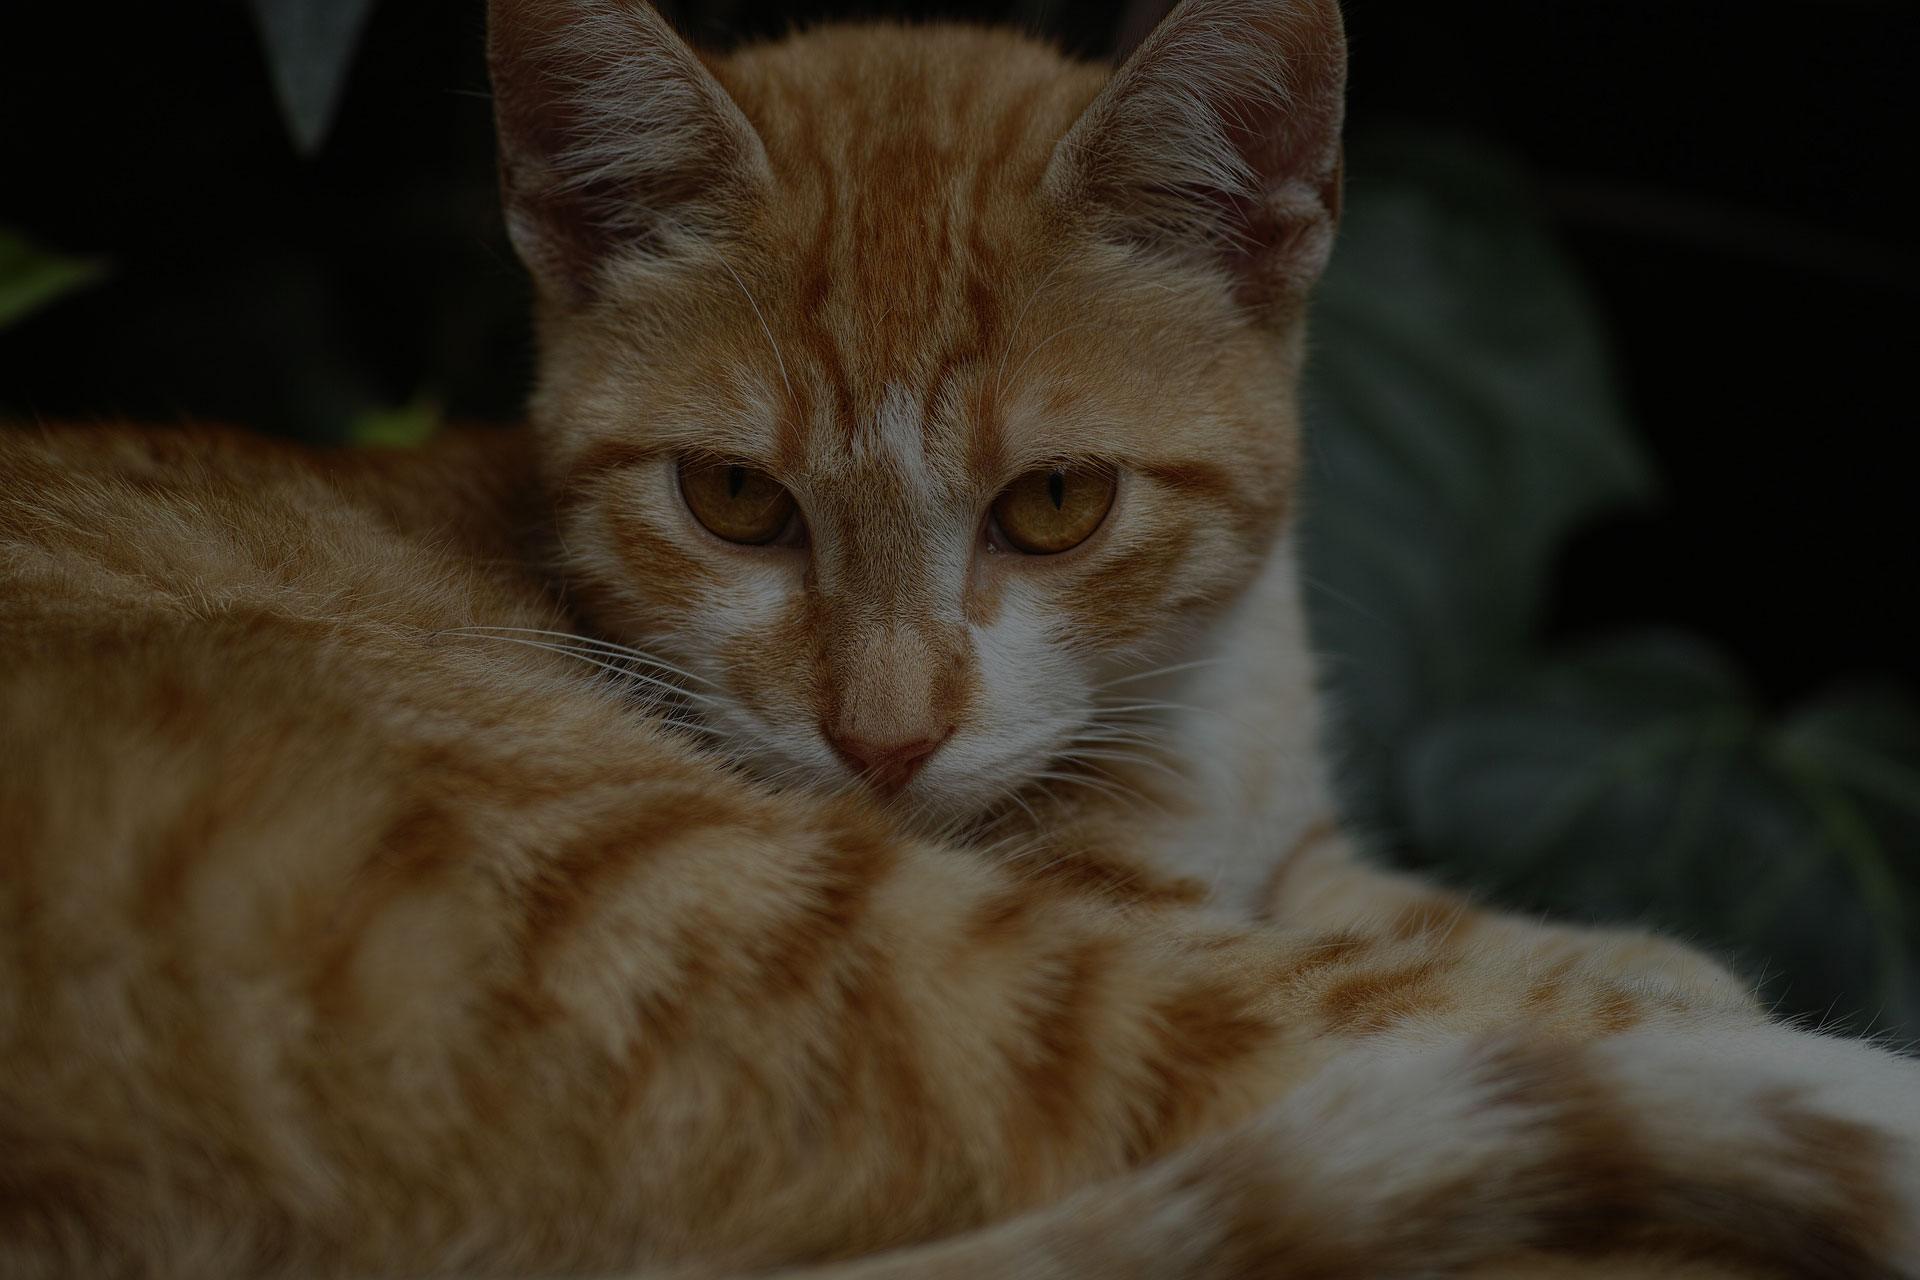 Golden Cat Looking at Camera